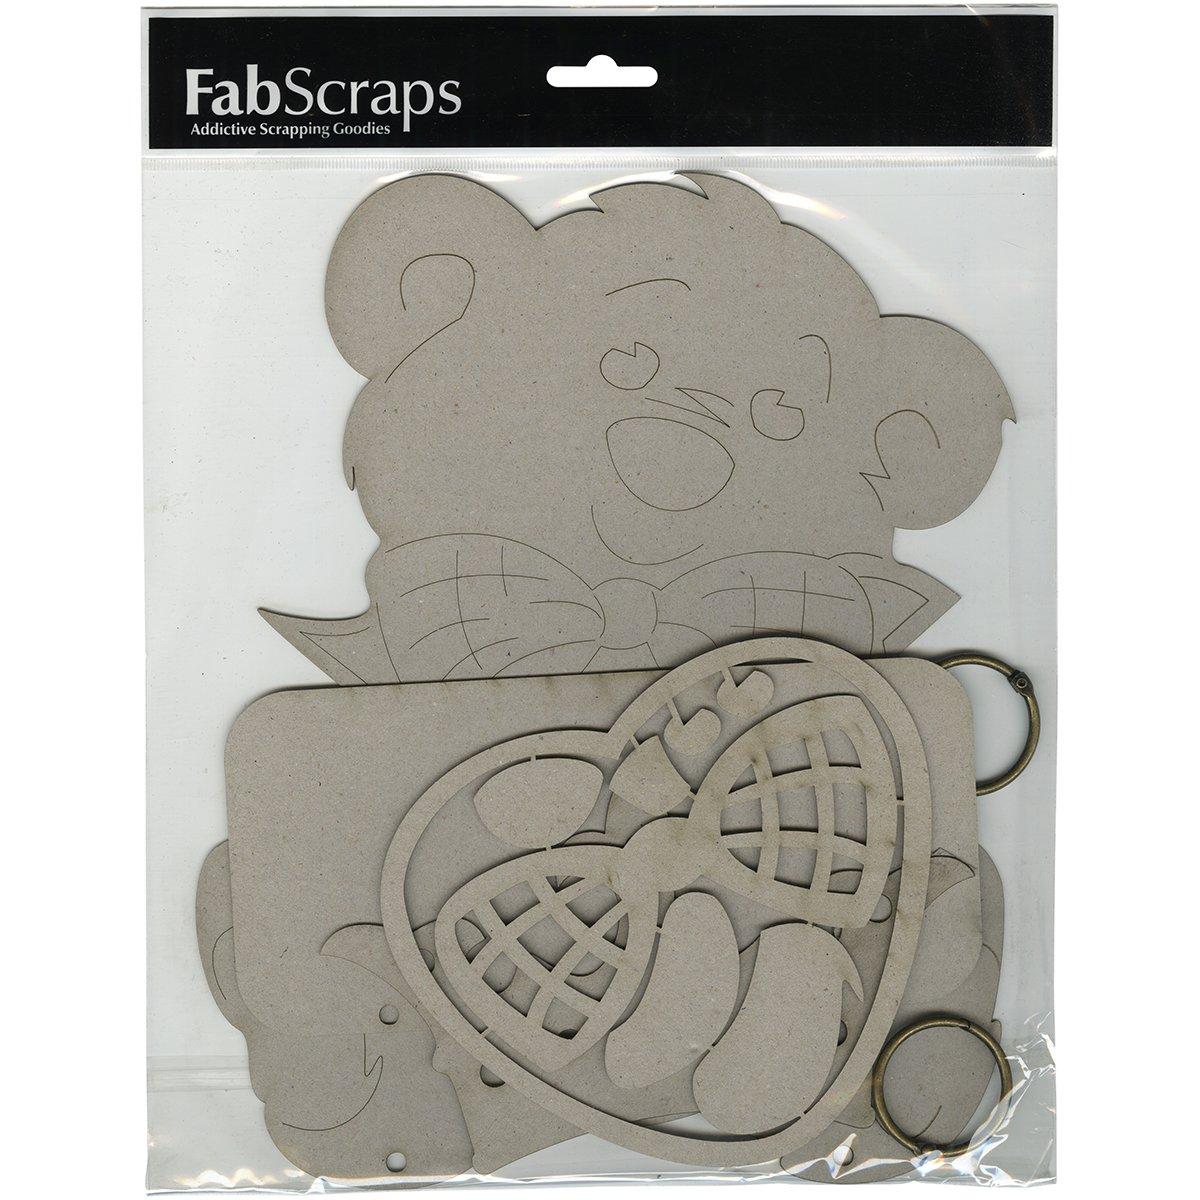 Fabscraps Cardboard Die-Cut Gray Chipboard Plaque-Teddy Bear, 10.5-inch x 8.5-inch DC70001